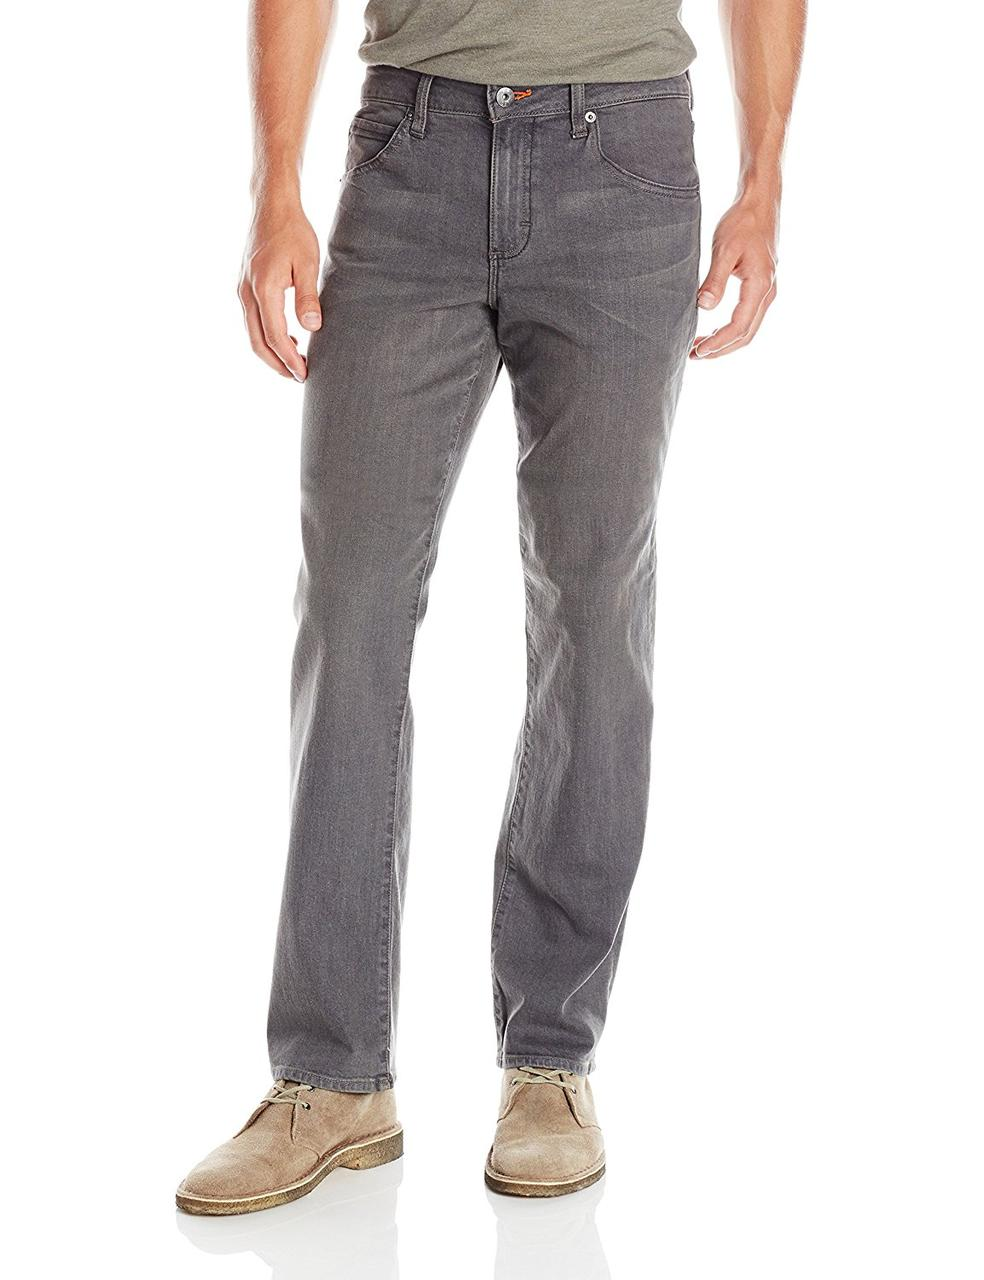 Джинсы Lee Modern Series Straight Fit Straight Leg, Smoky, 31W30L, 2013655